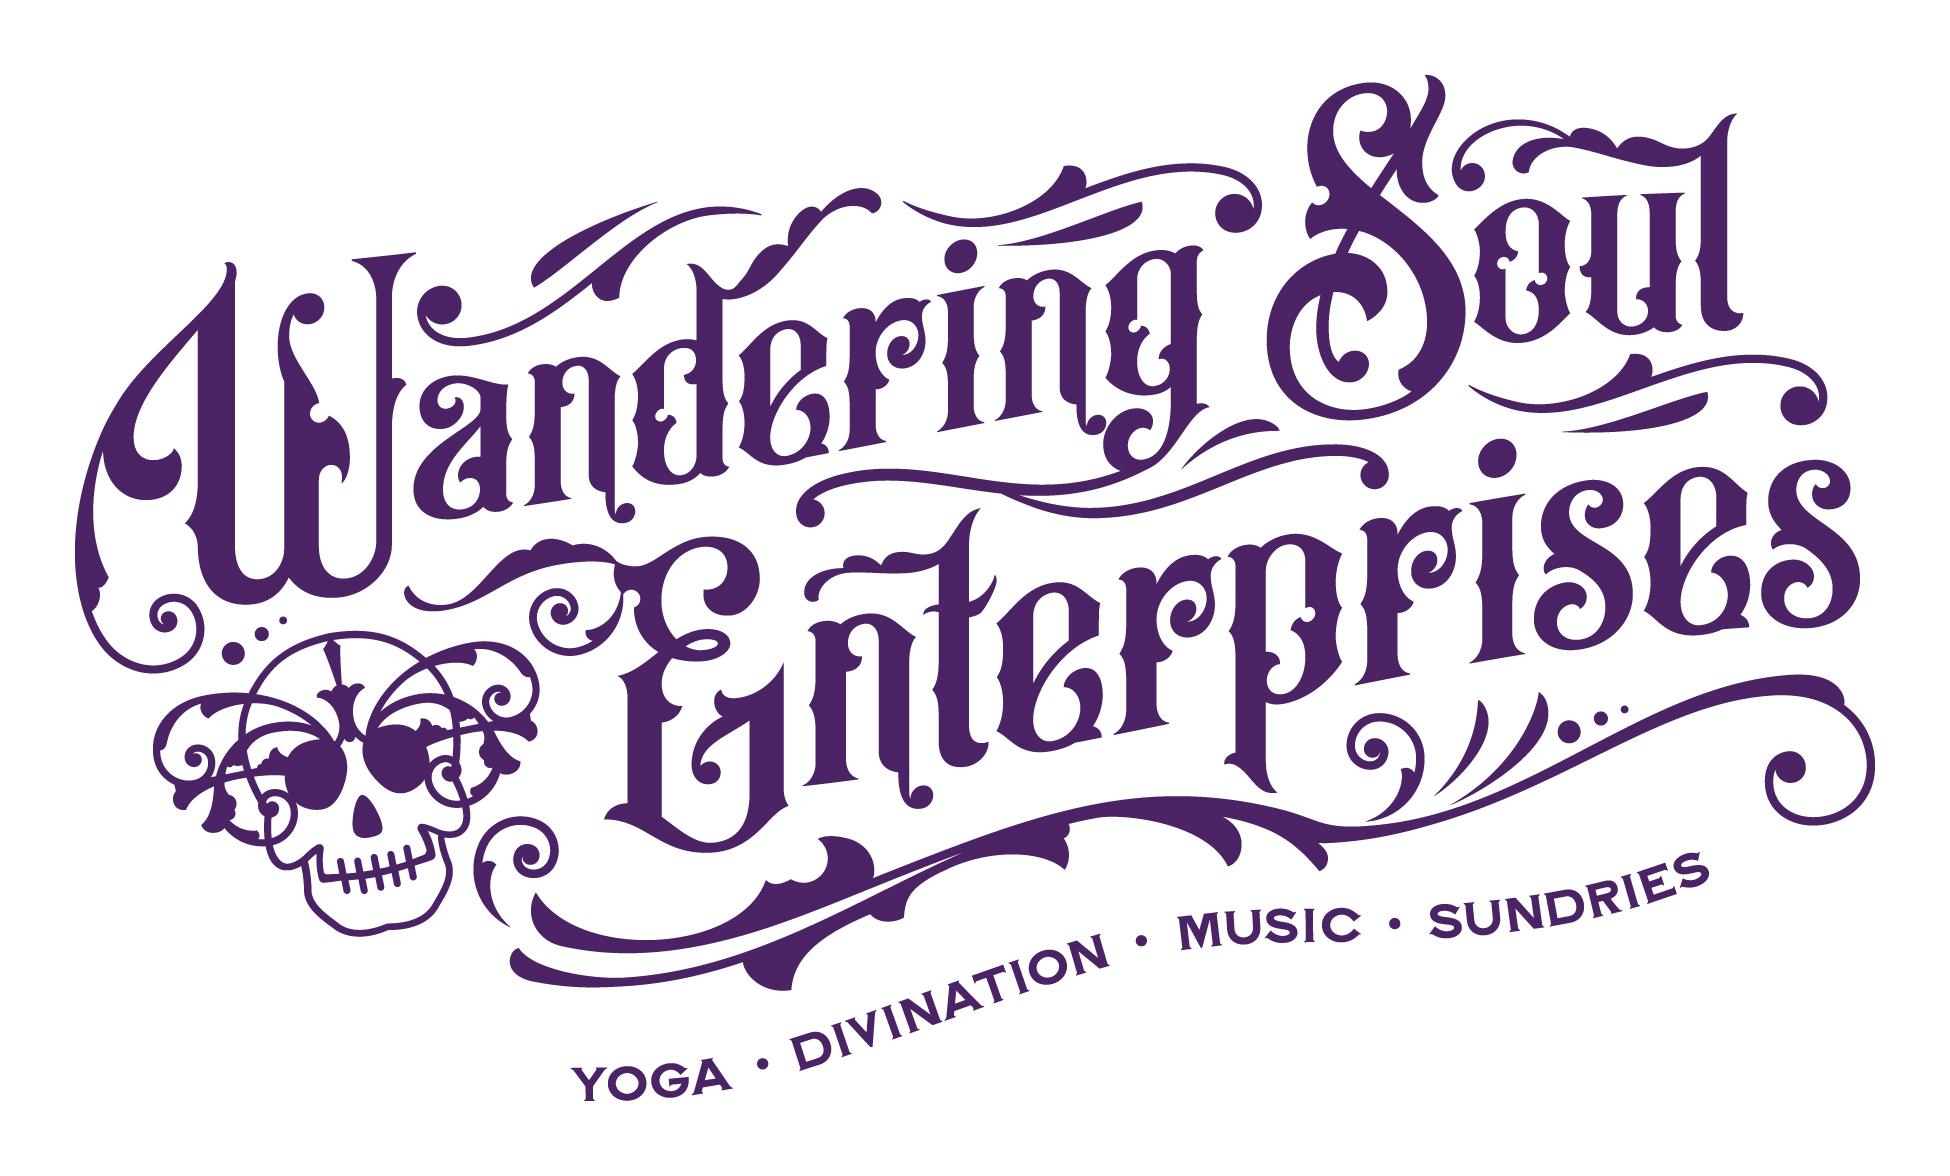 Wandering Soul Enterprises